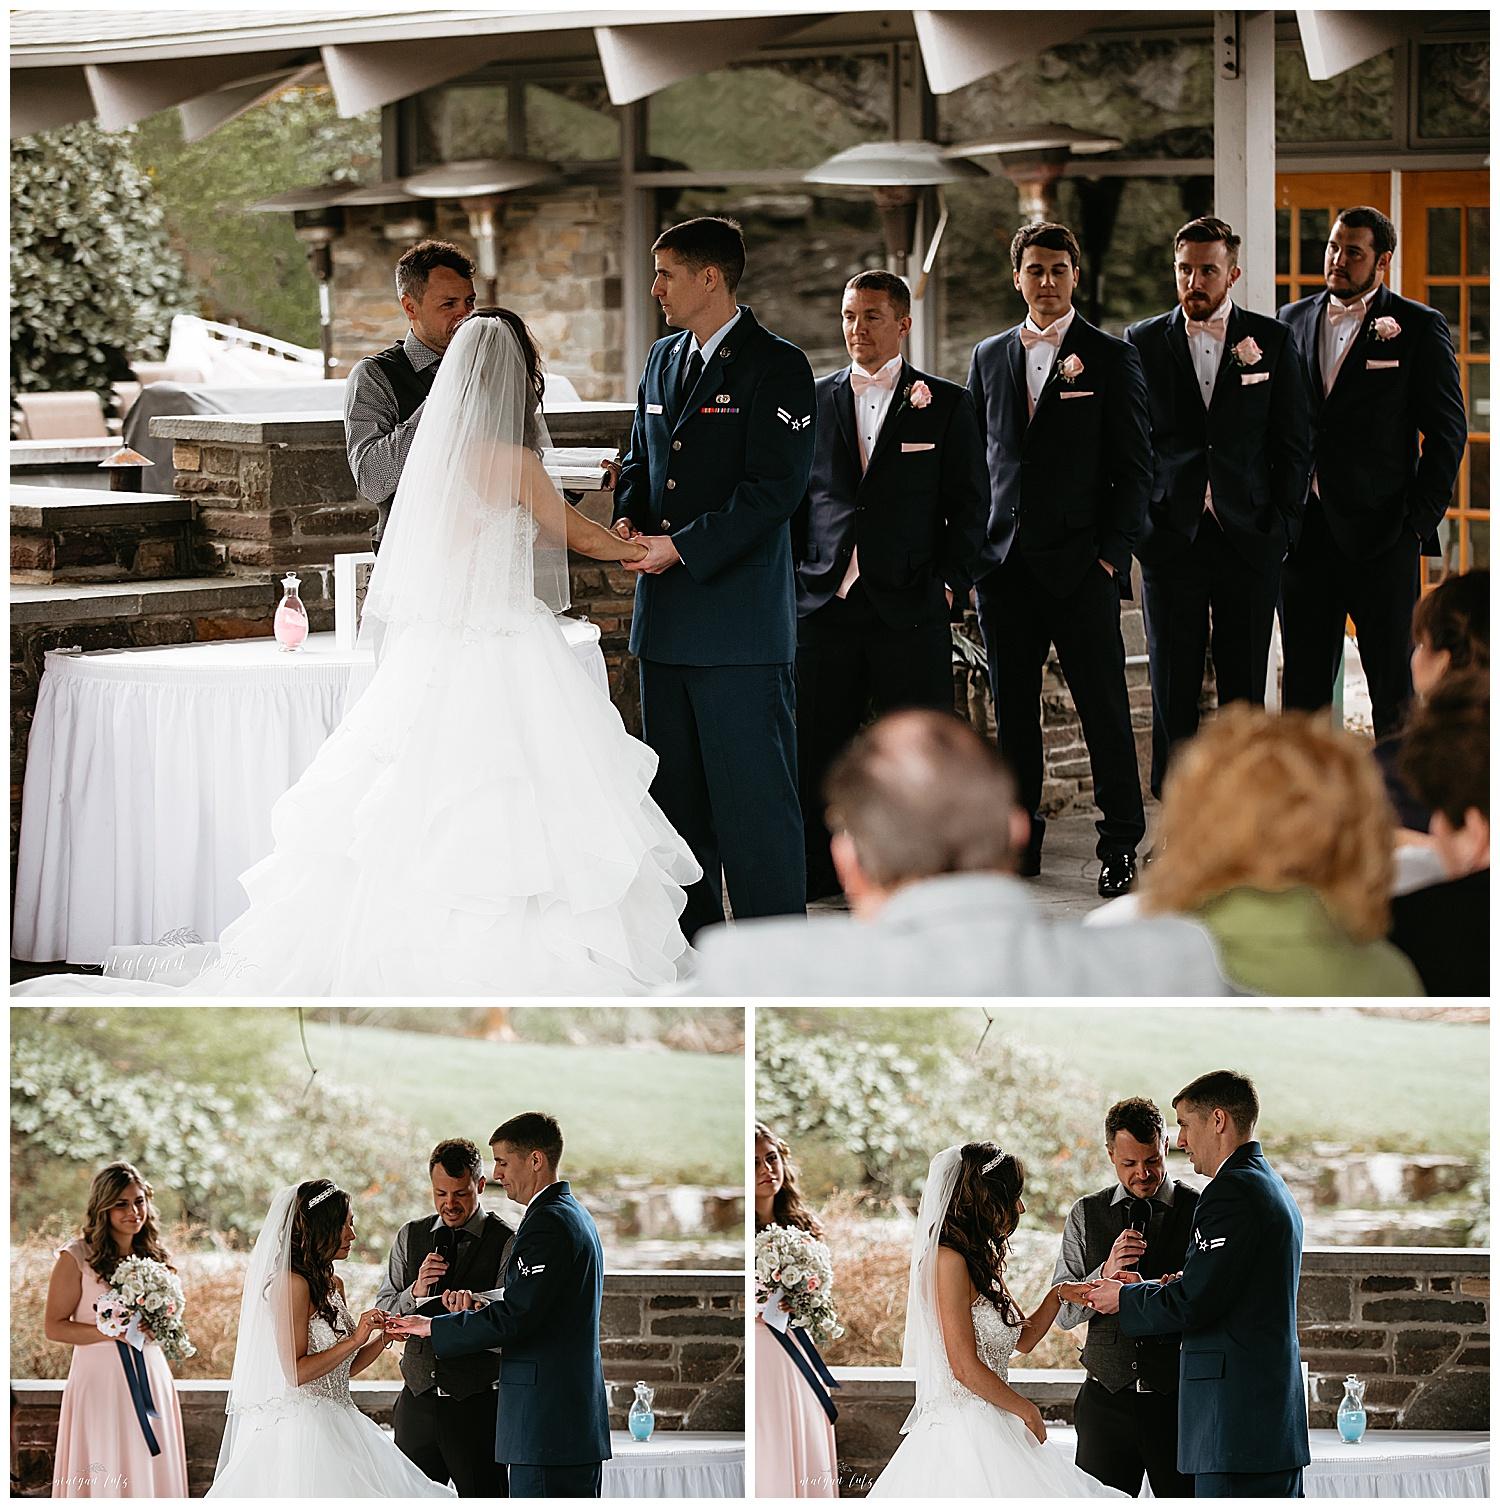 NEPA-Lehigh-Valley-Wedding-Photographer-at-Glen-Oak-Country-Club-Clarks-Summit-PA_0045.jpg